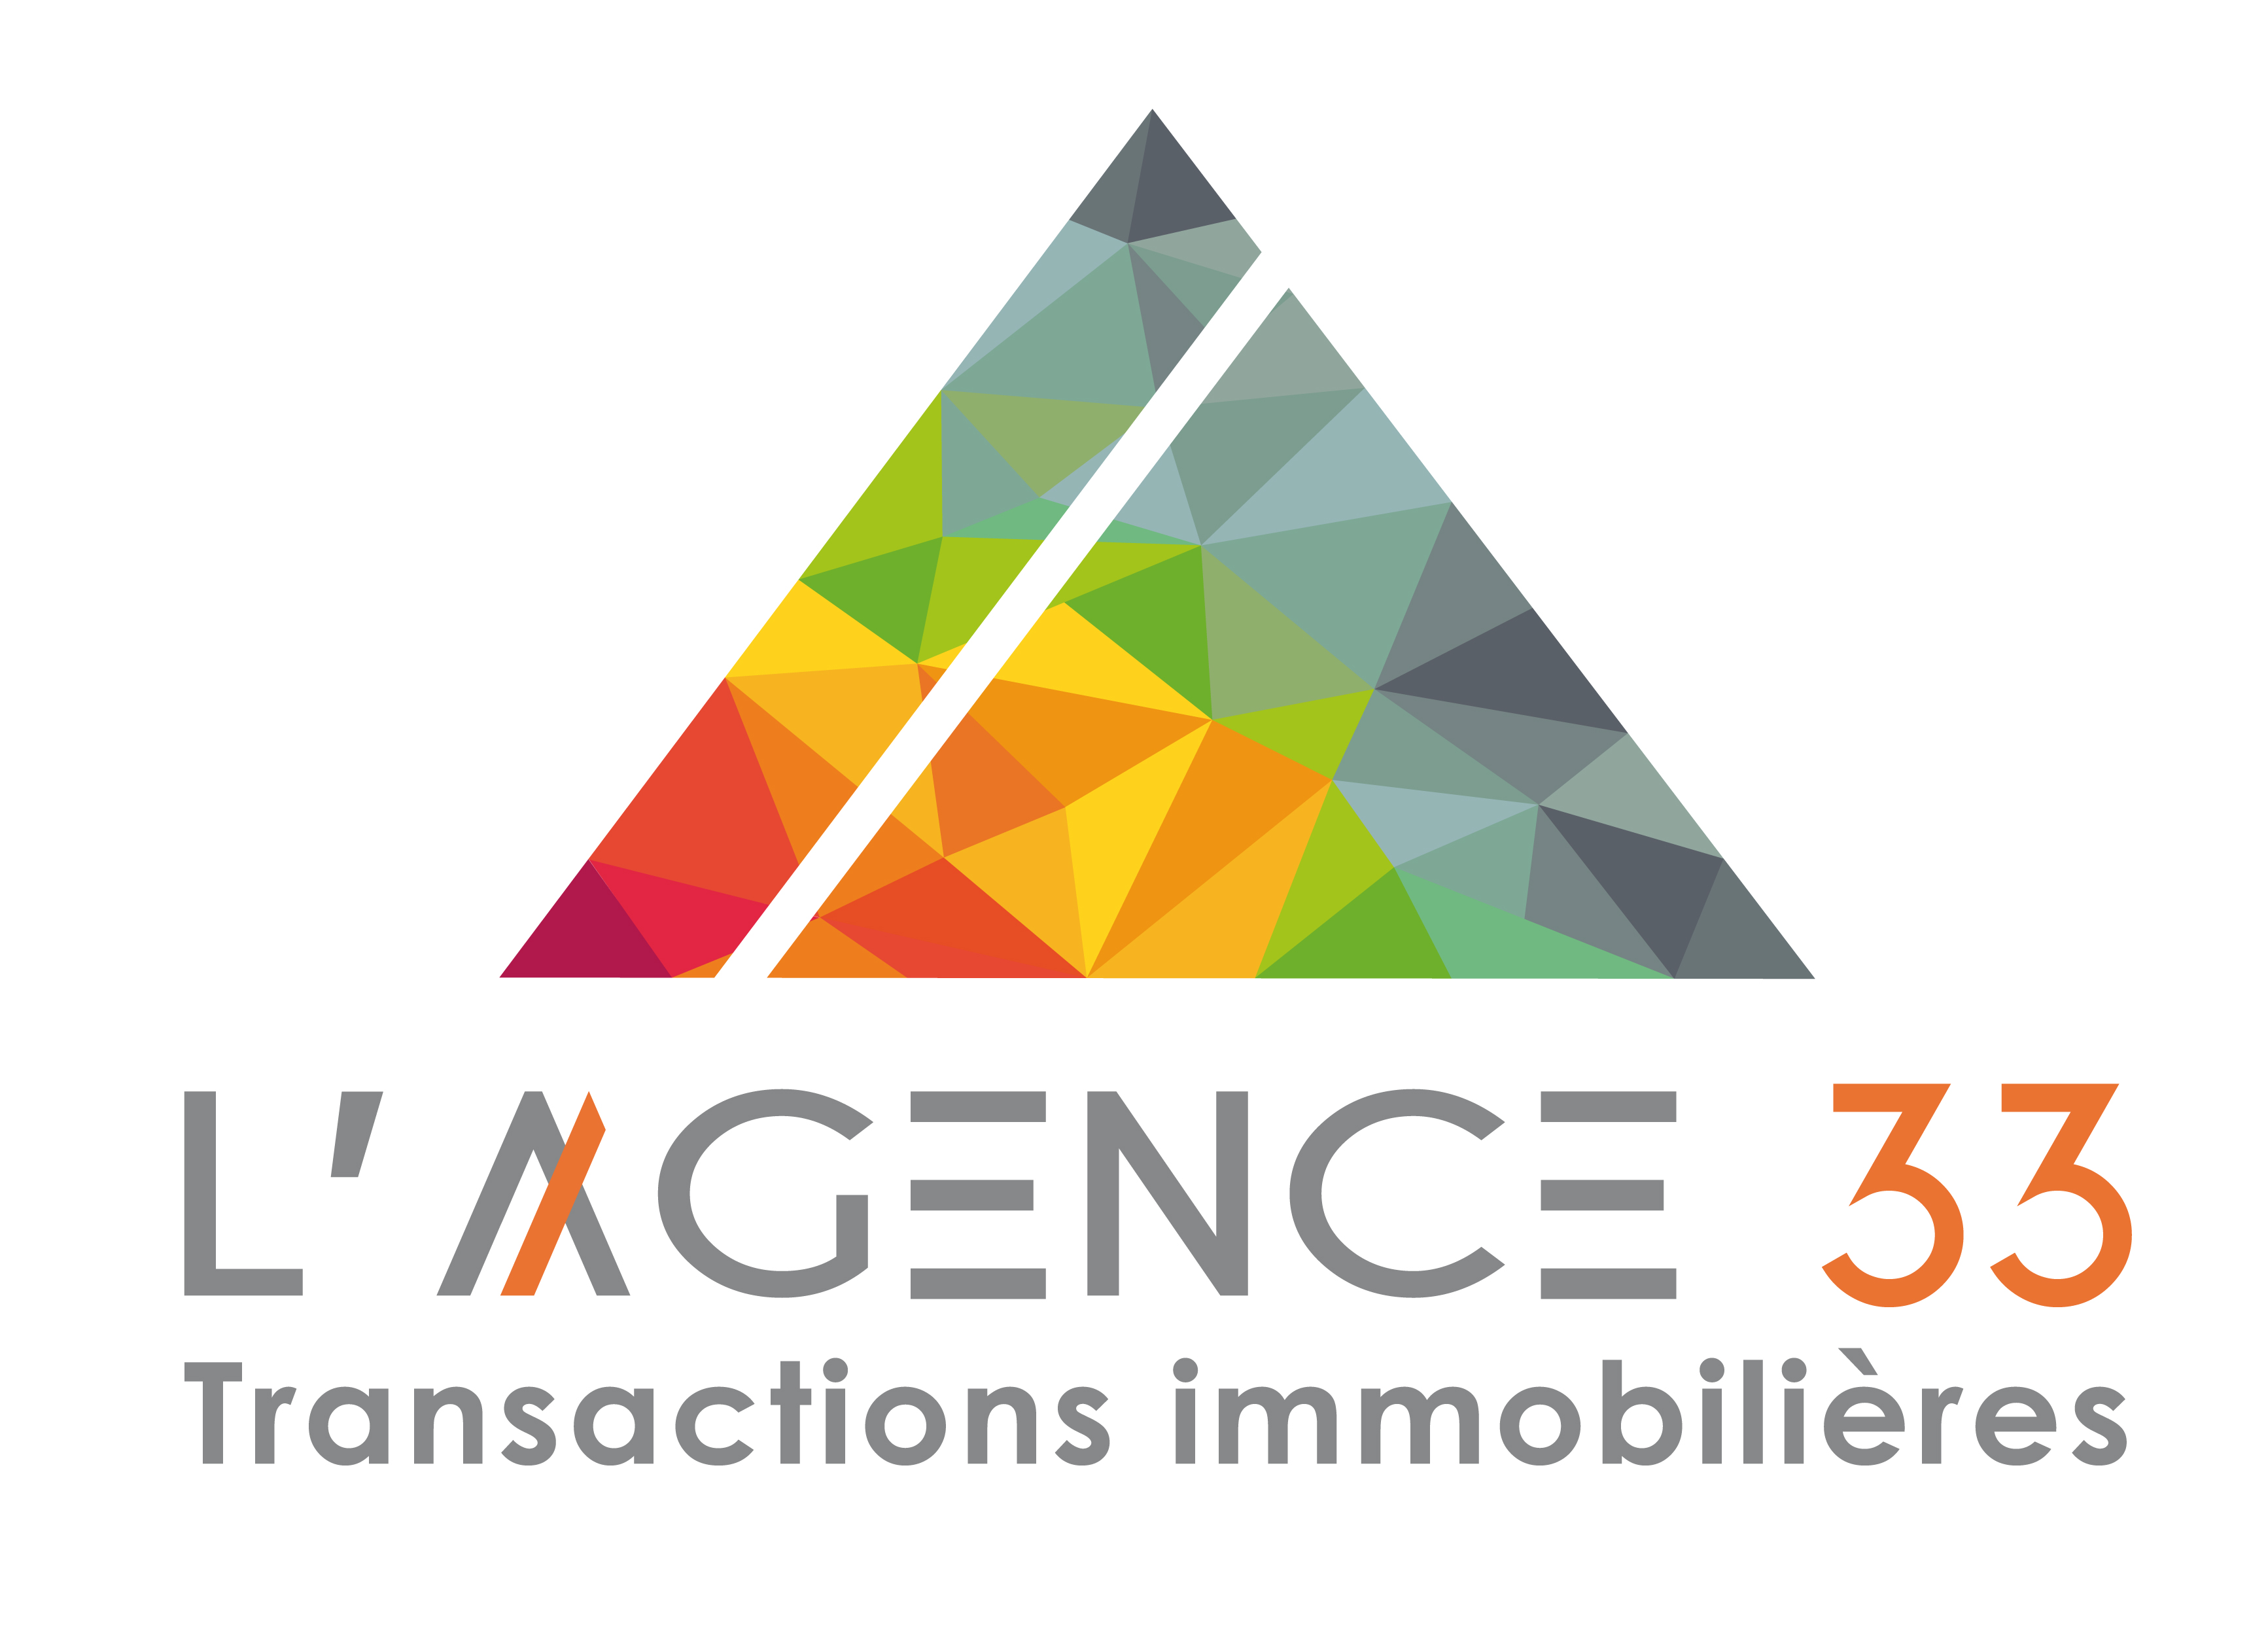 L'AGENCE 33 agence immobilière Mérignac (33700)